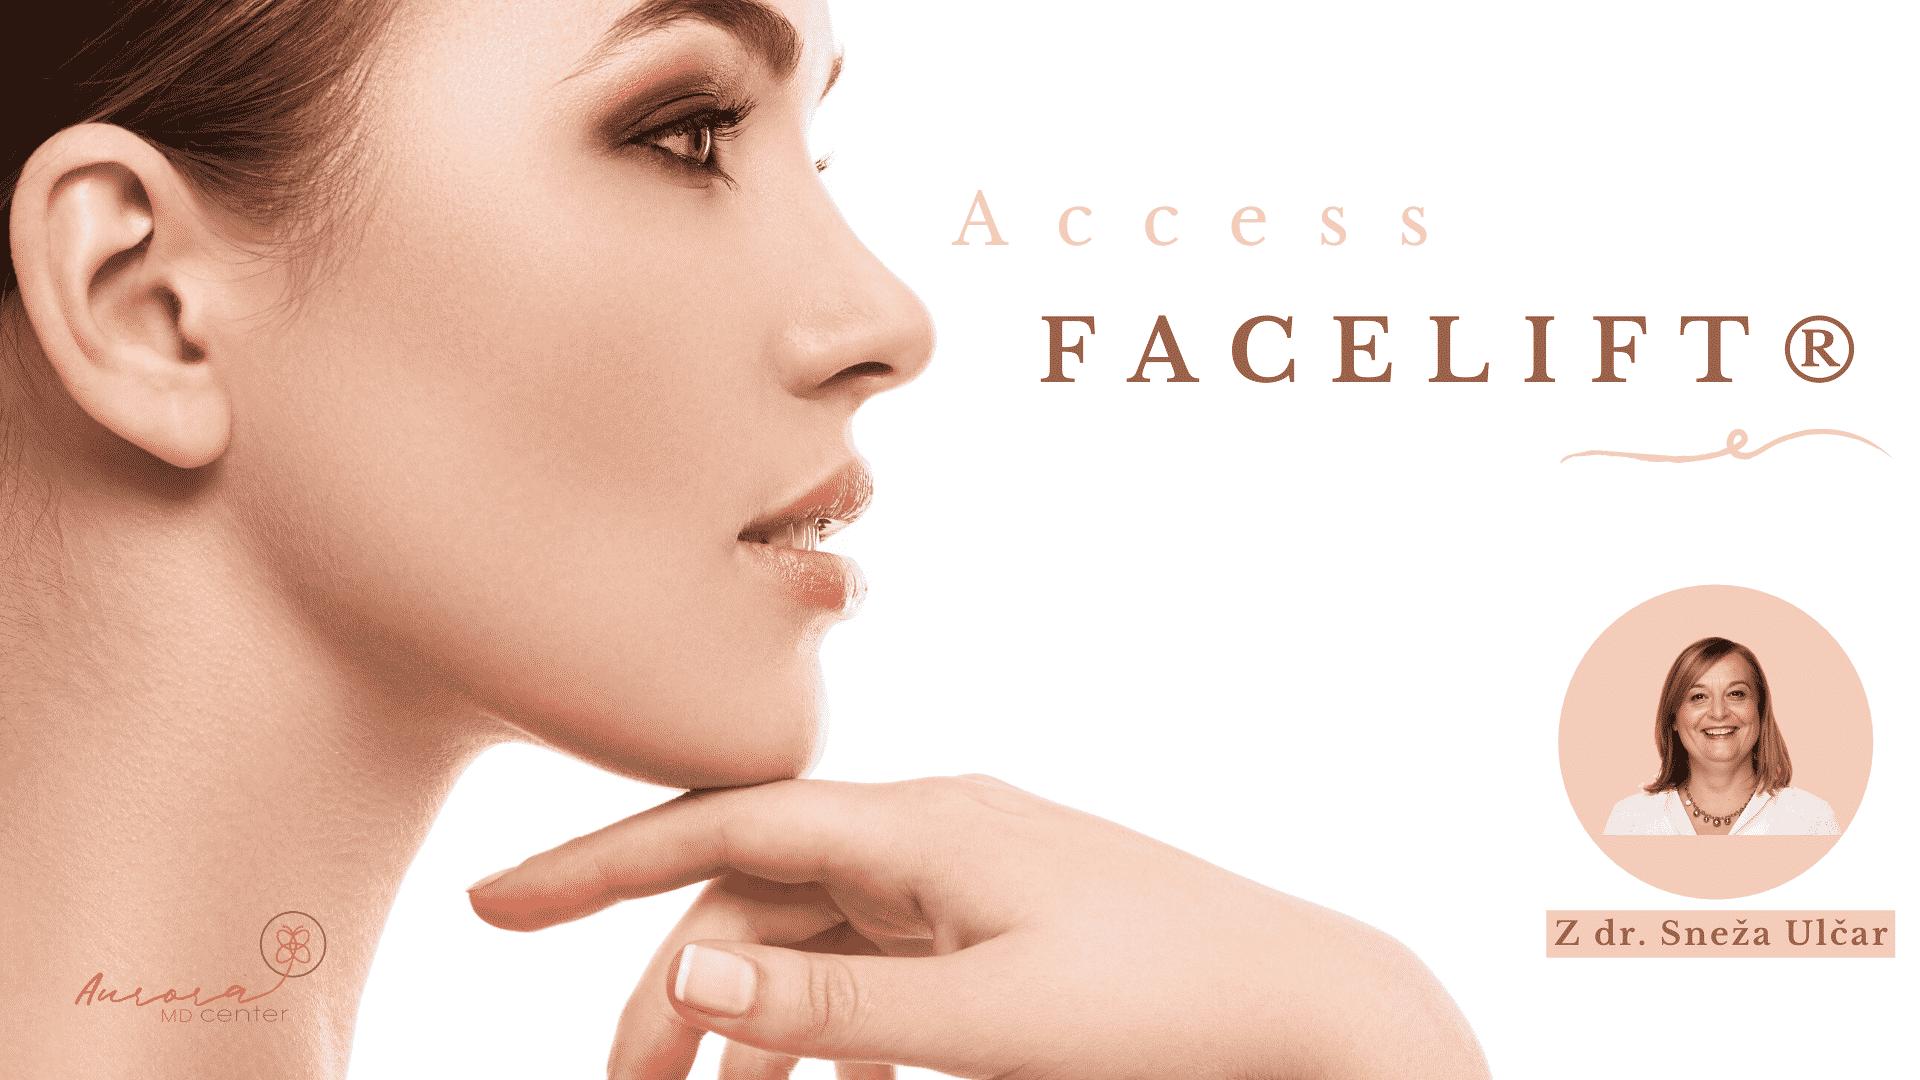 Access Energijski Facelift® delavnica s Snežo Ulčar, dr.med.